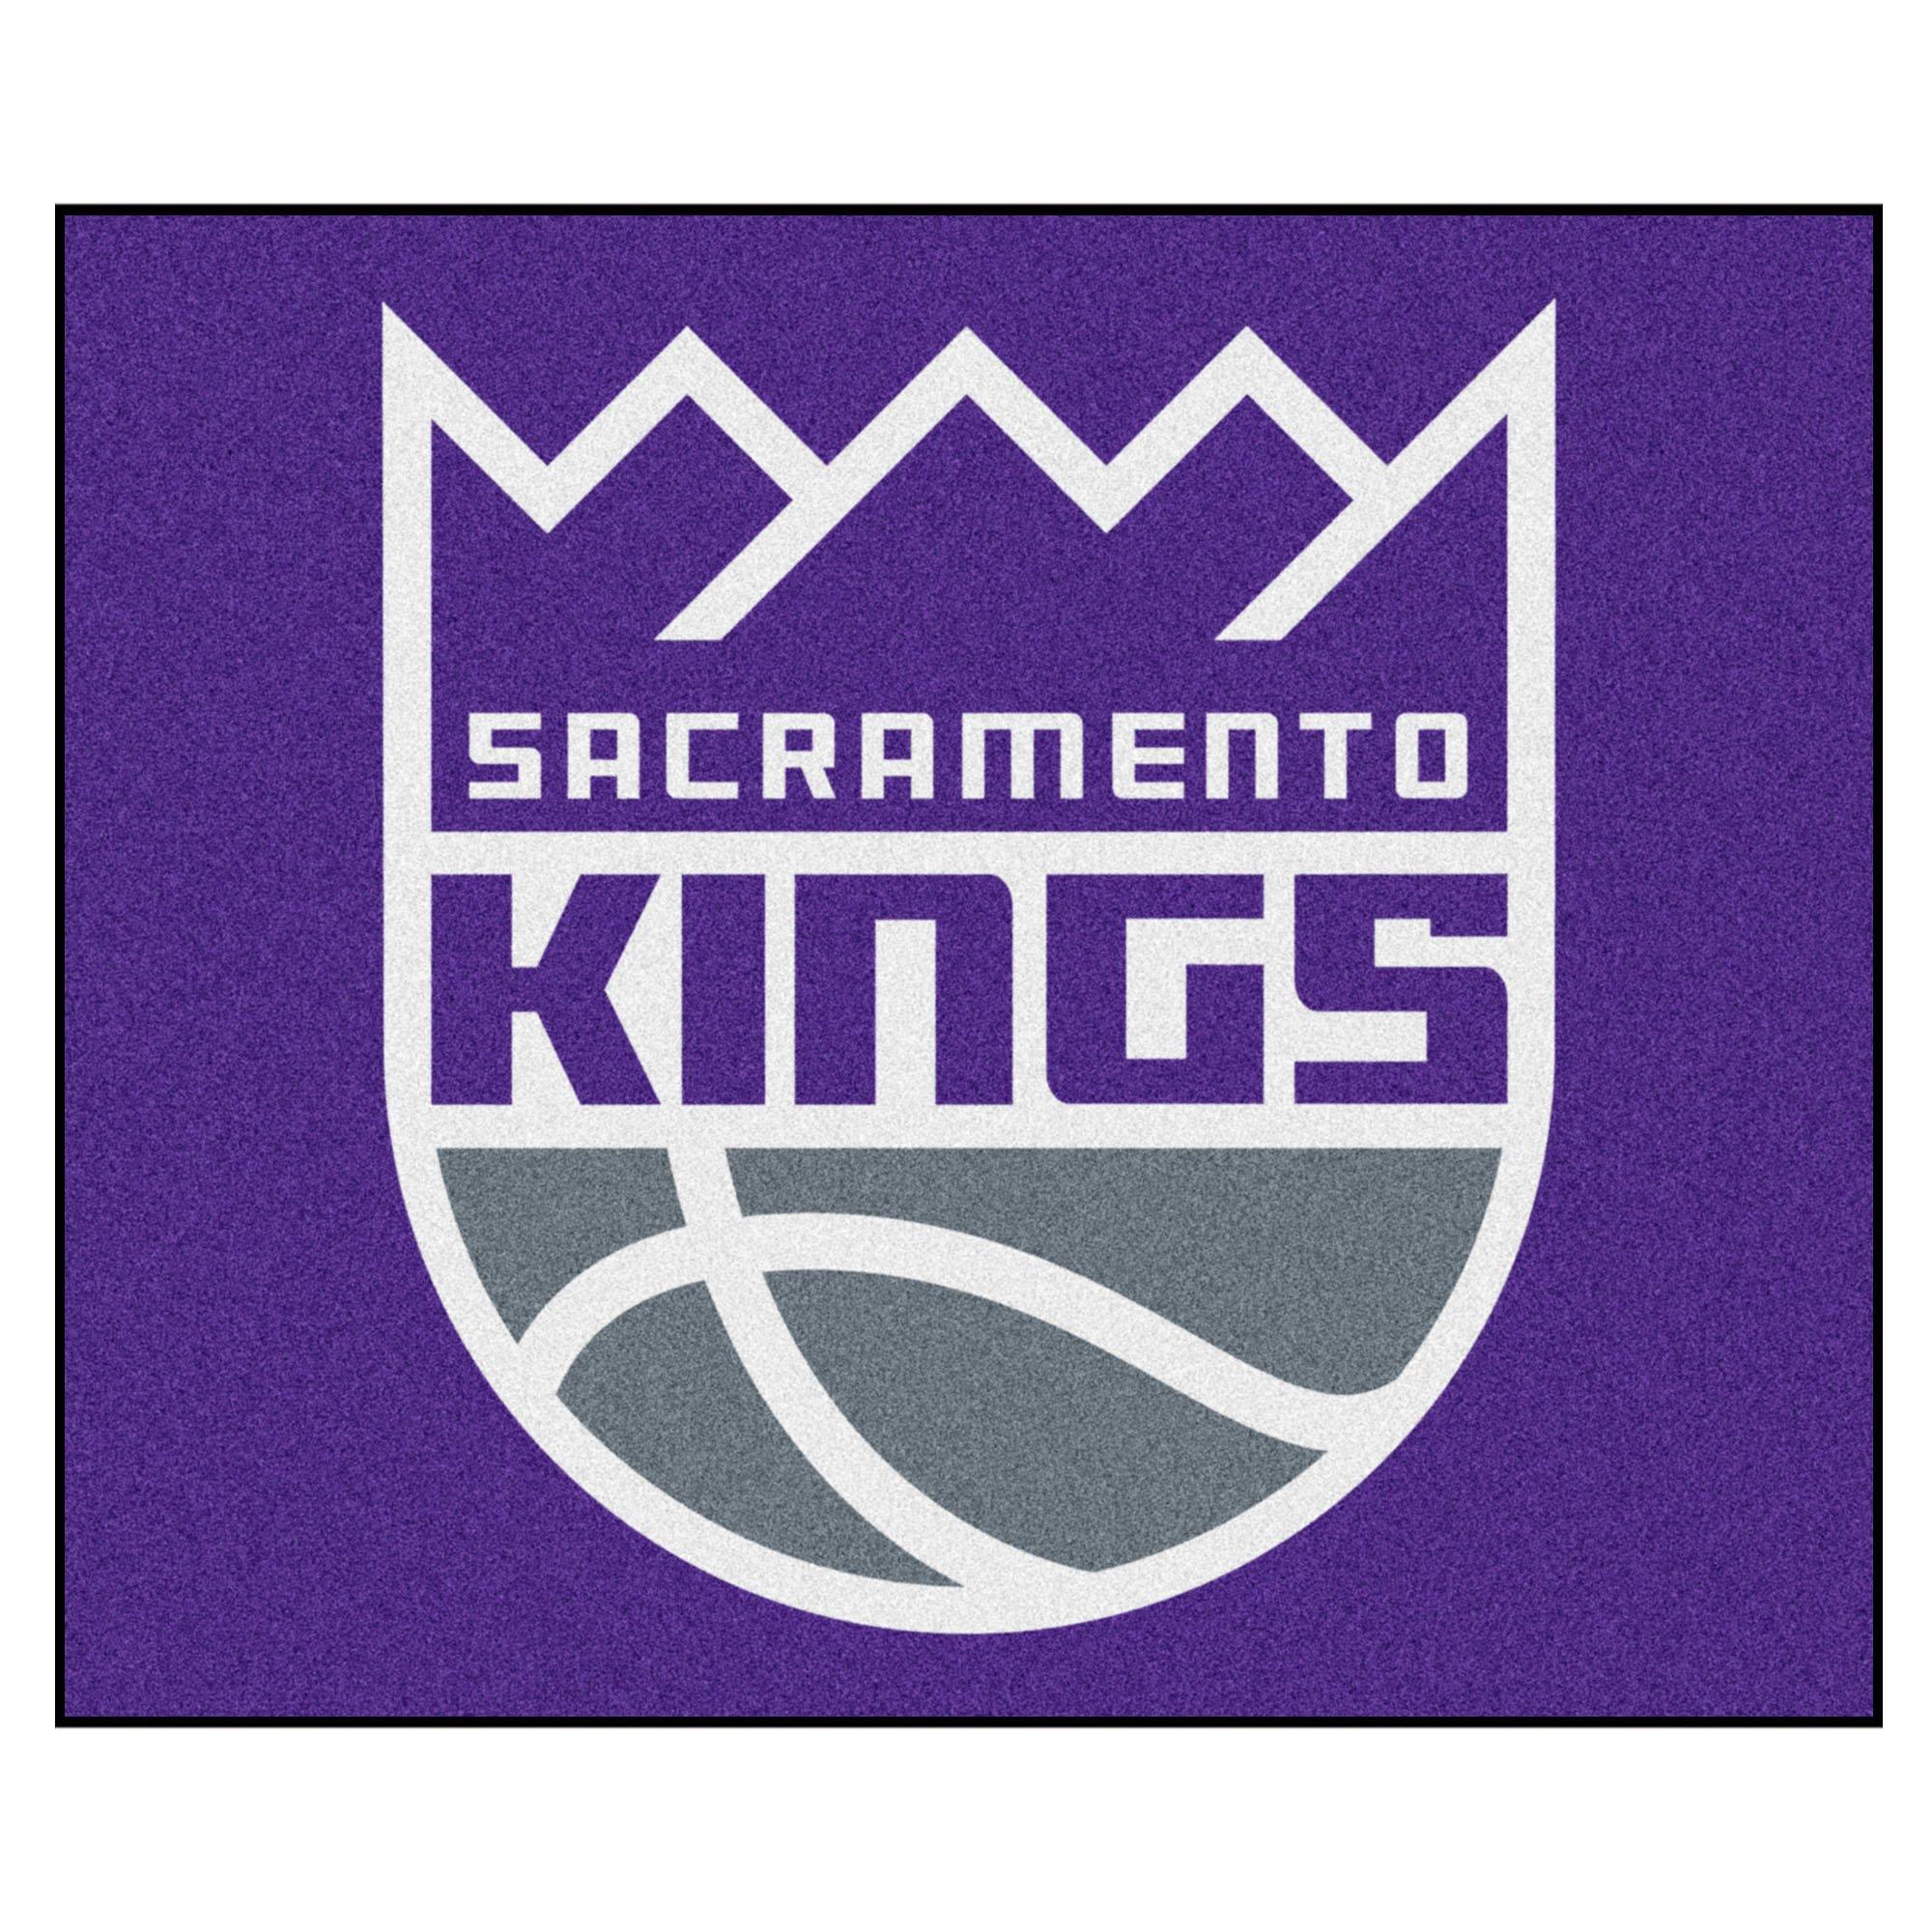 FANMATS 19474 NBA - Sacramento Kings Tailgater Rug , Team Color, 59.5''x71''